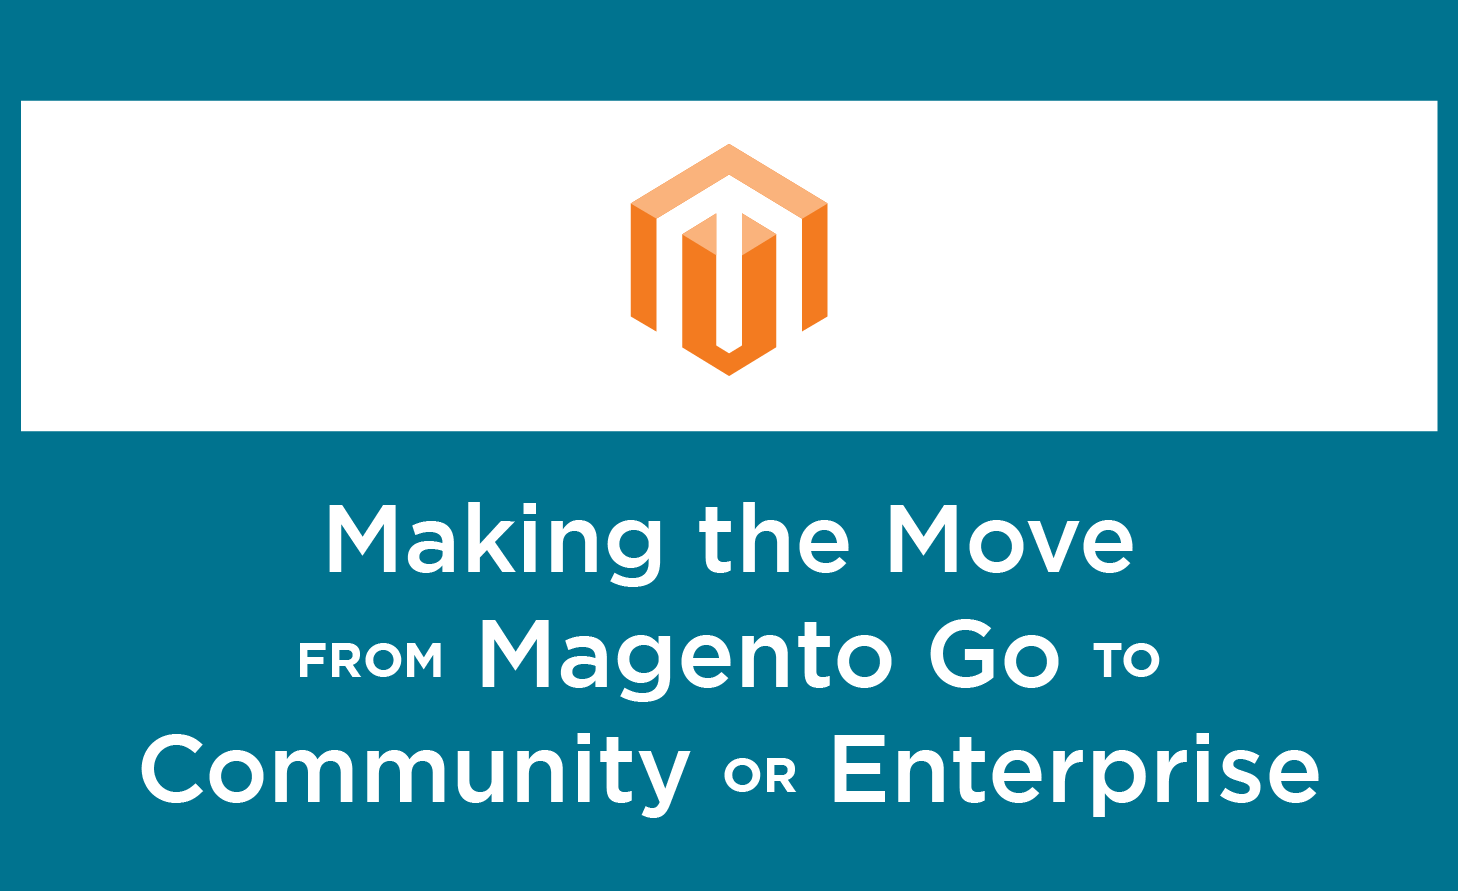 move-magento-go-community-enterprise-linkedin